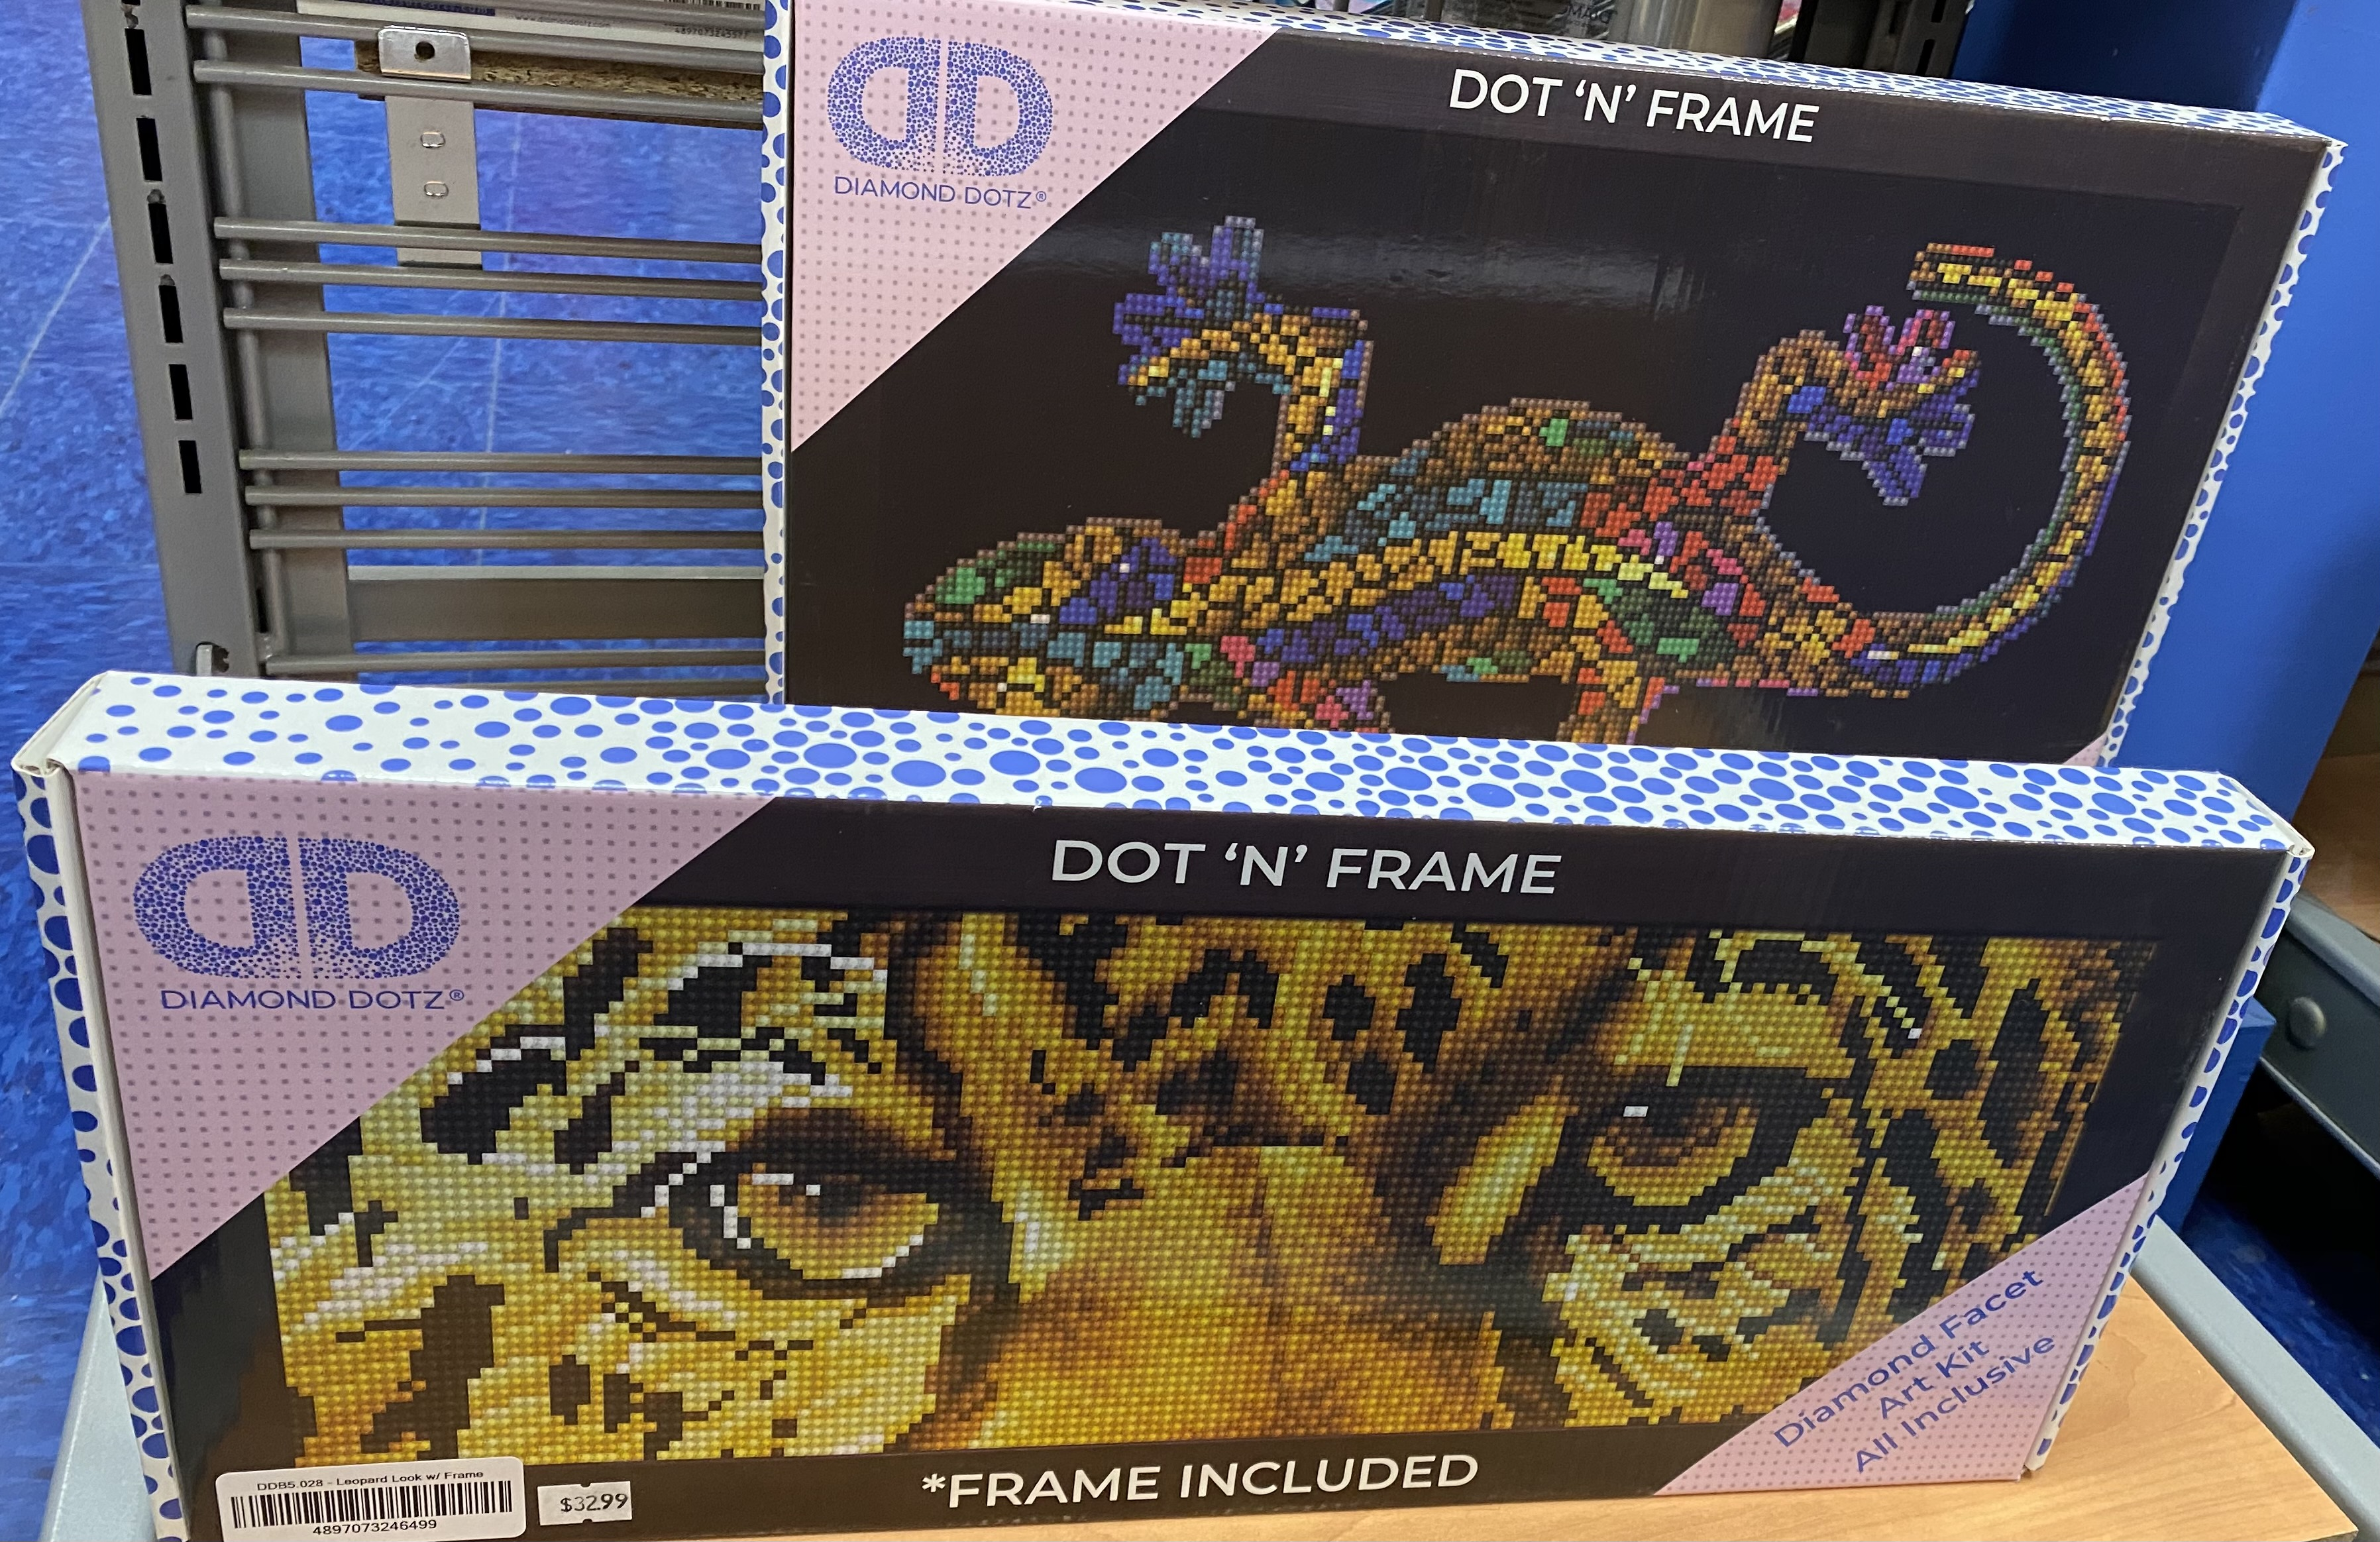 Boxed framed DD kits